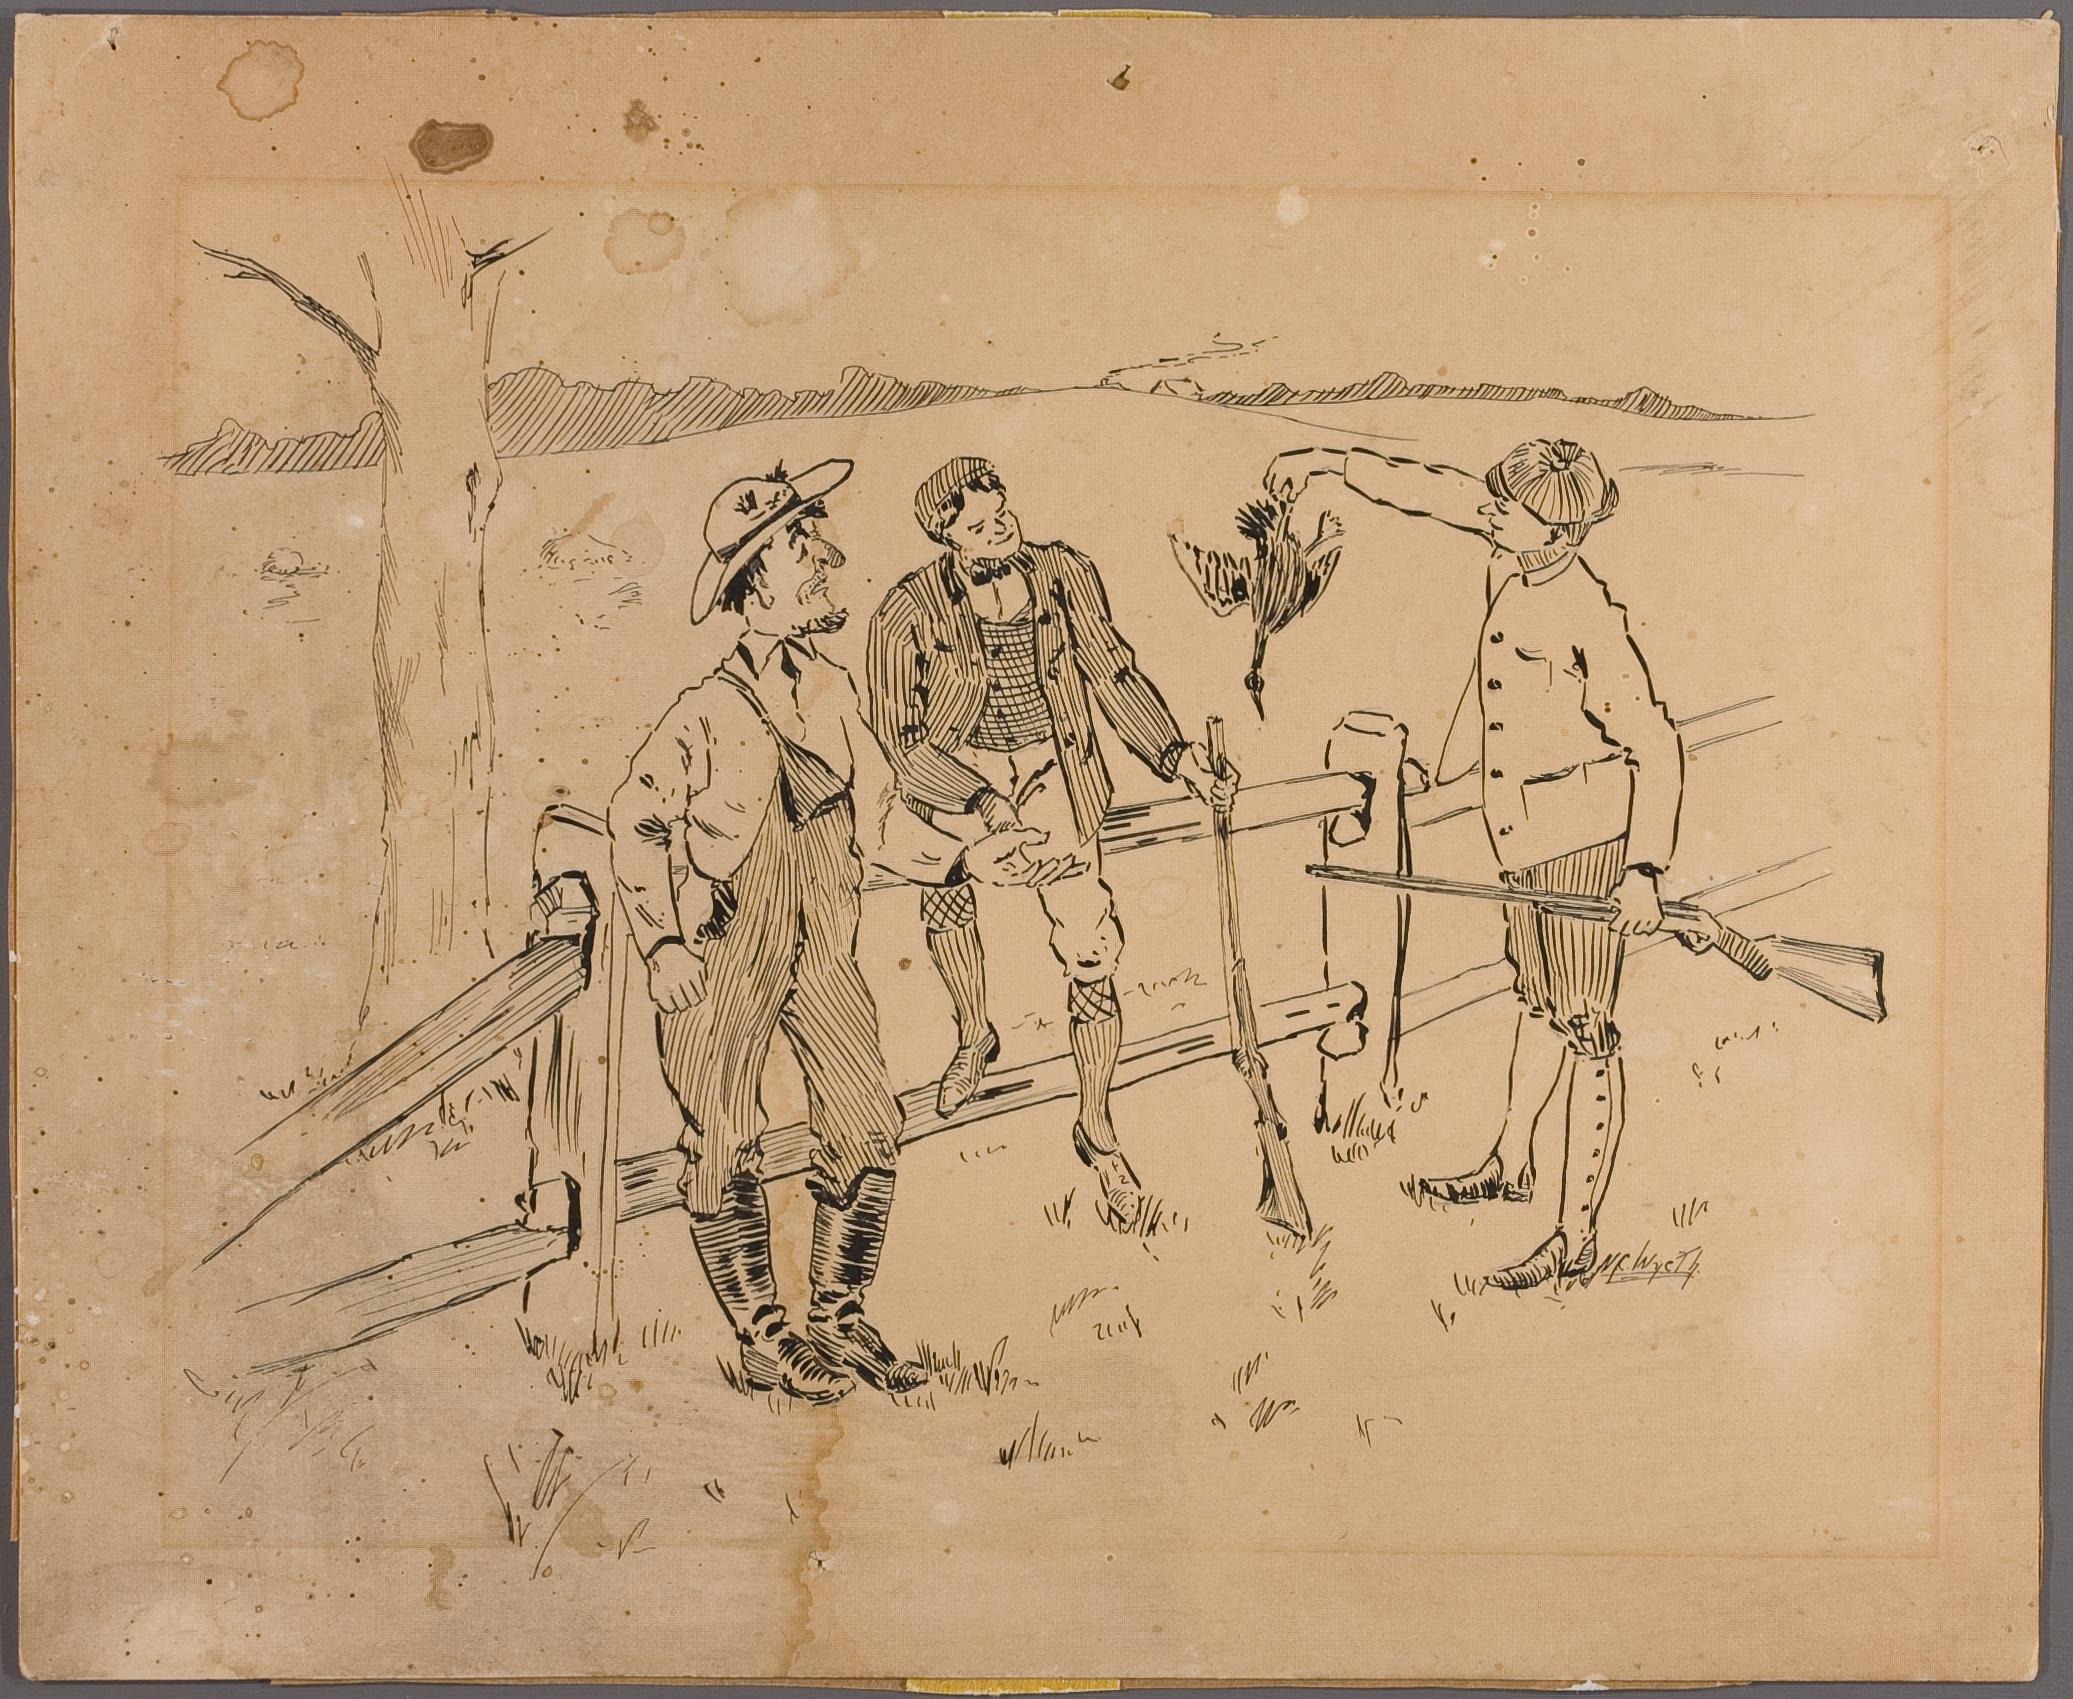 NC_Wyeth_drawing-03-before